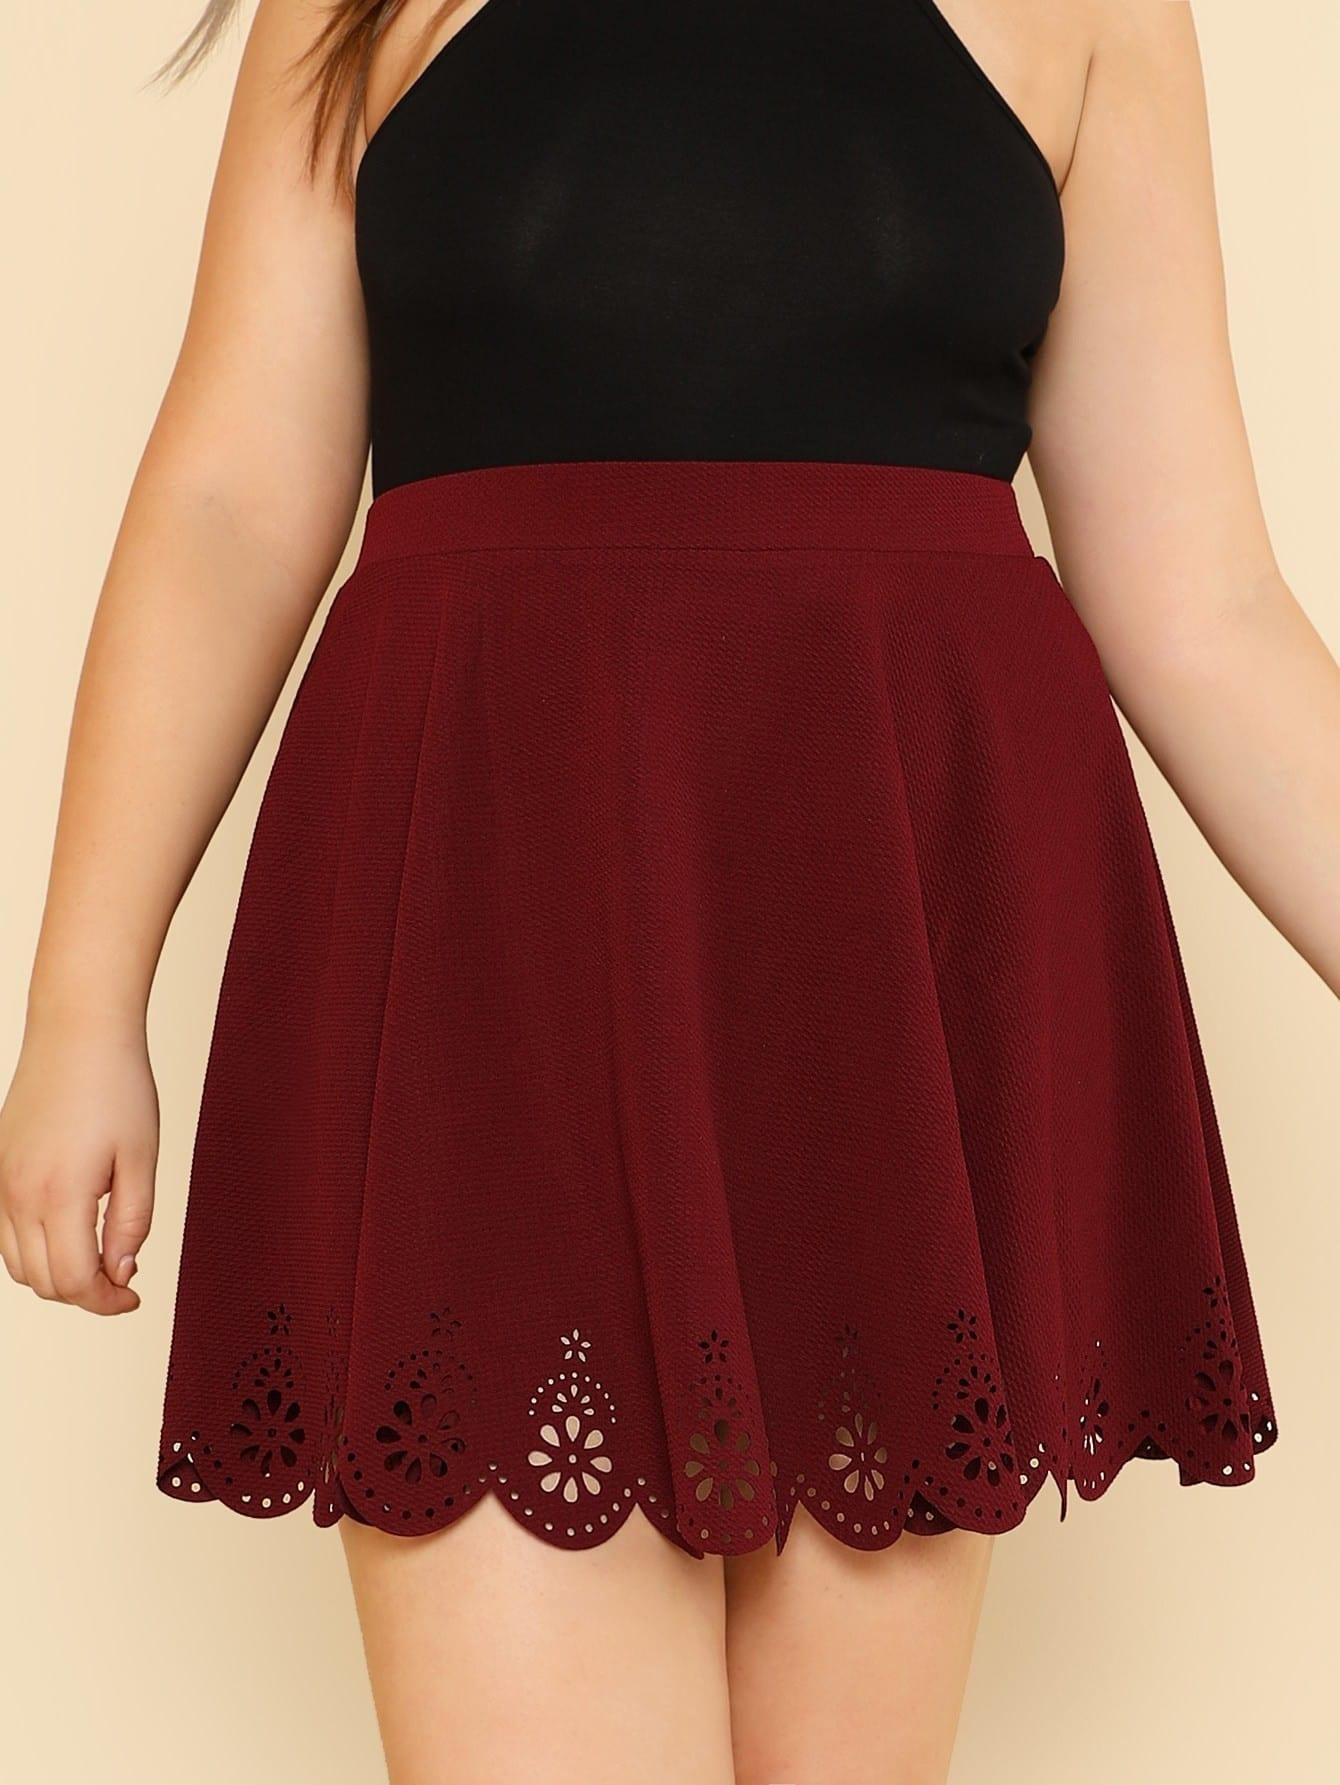 Scallop Laser Cut Flared Skirt asymmetric scallop hem flared pants